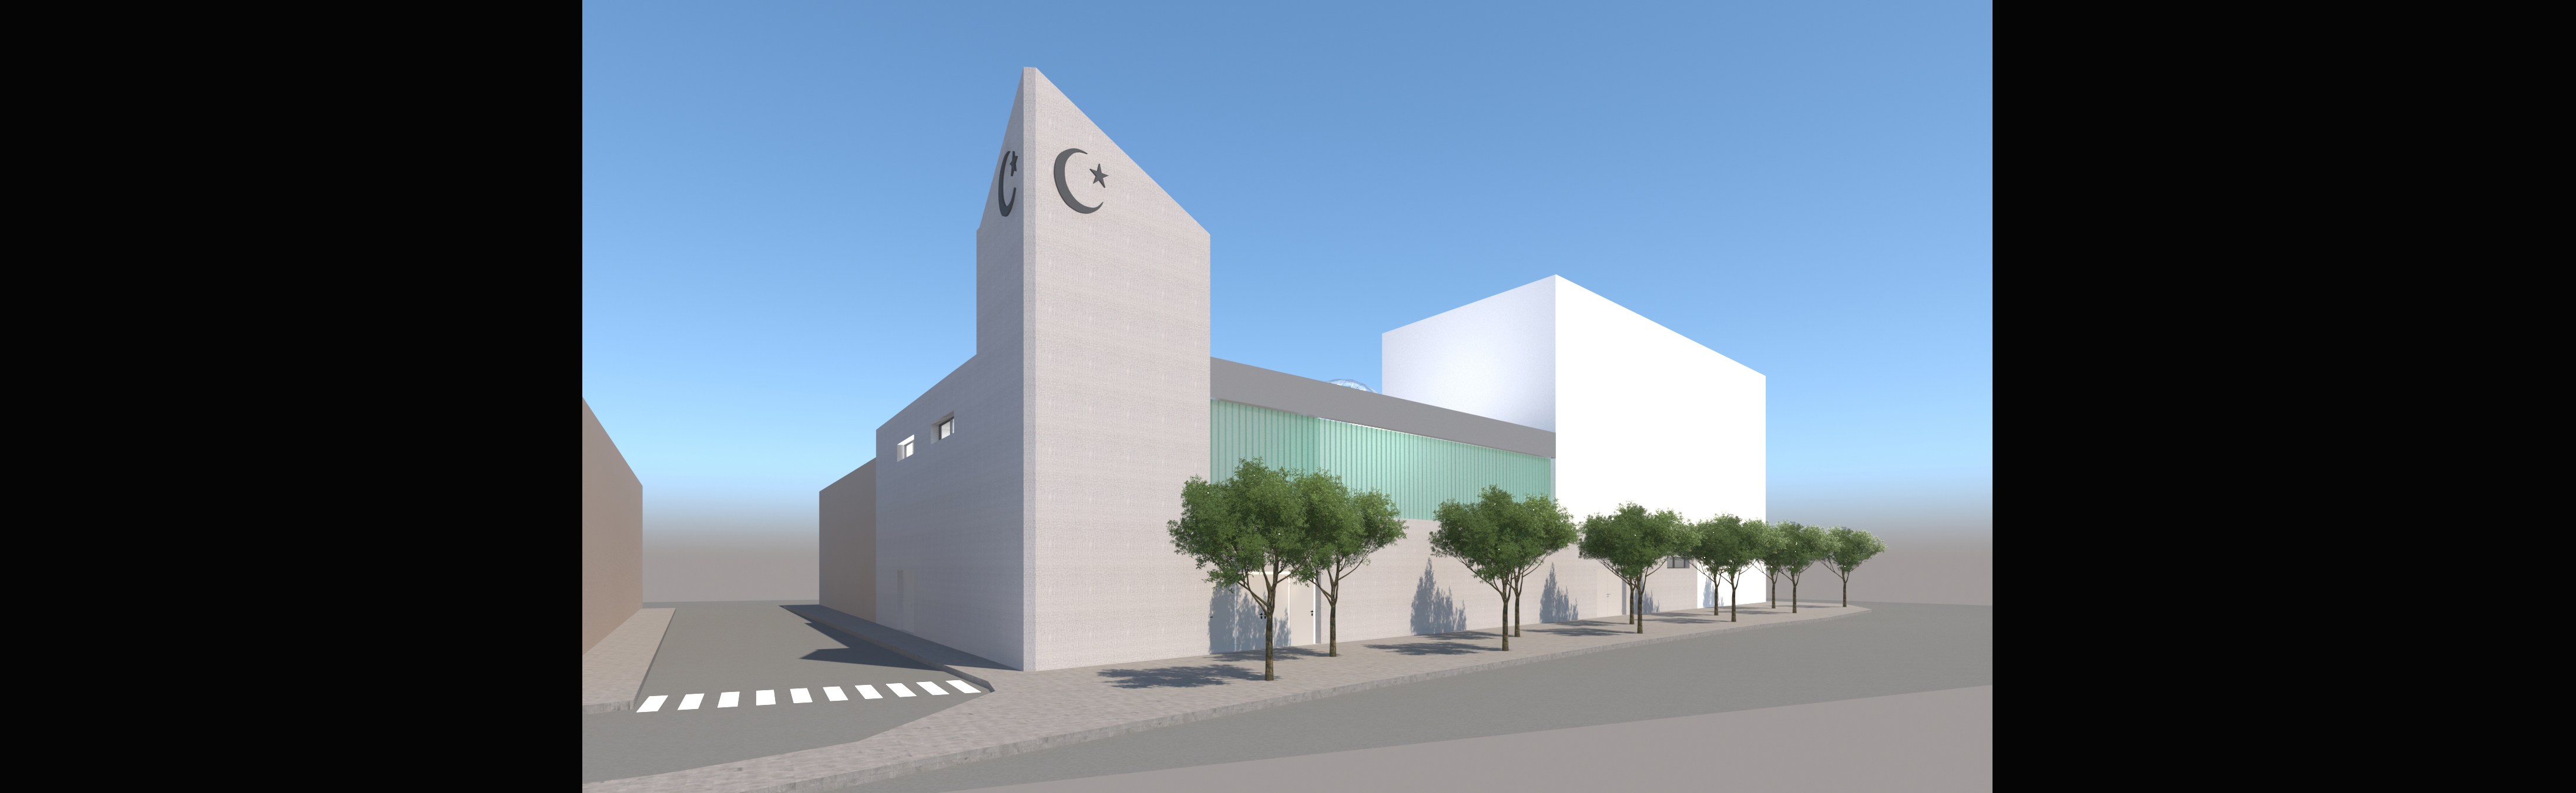 Mesquita Figueres